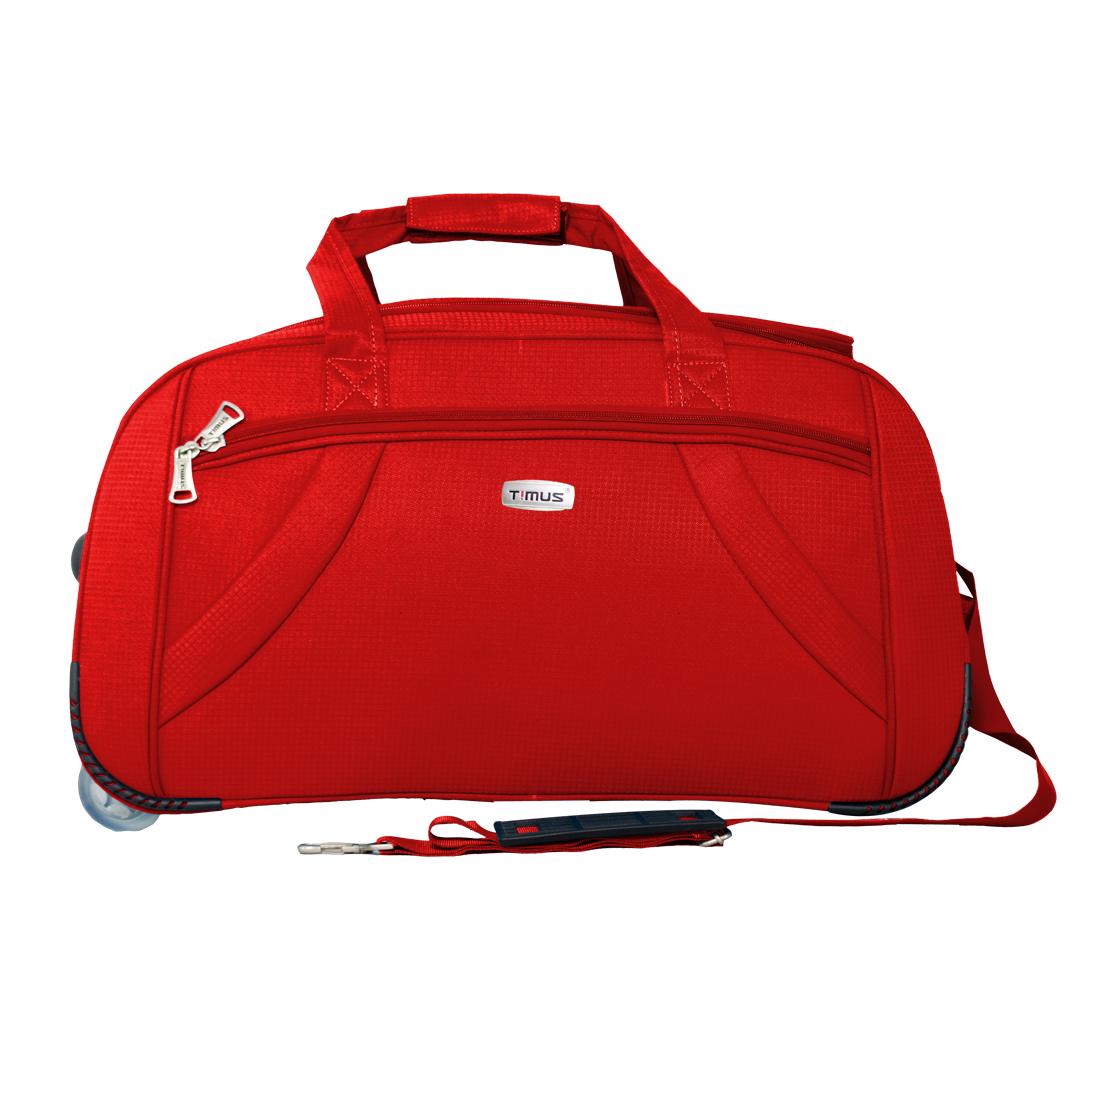 Timus Club Mumbai 65CM Red 2 Wheel Duffle Trolley Bag for Travel  Check In Luggage